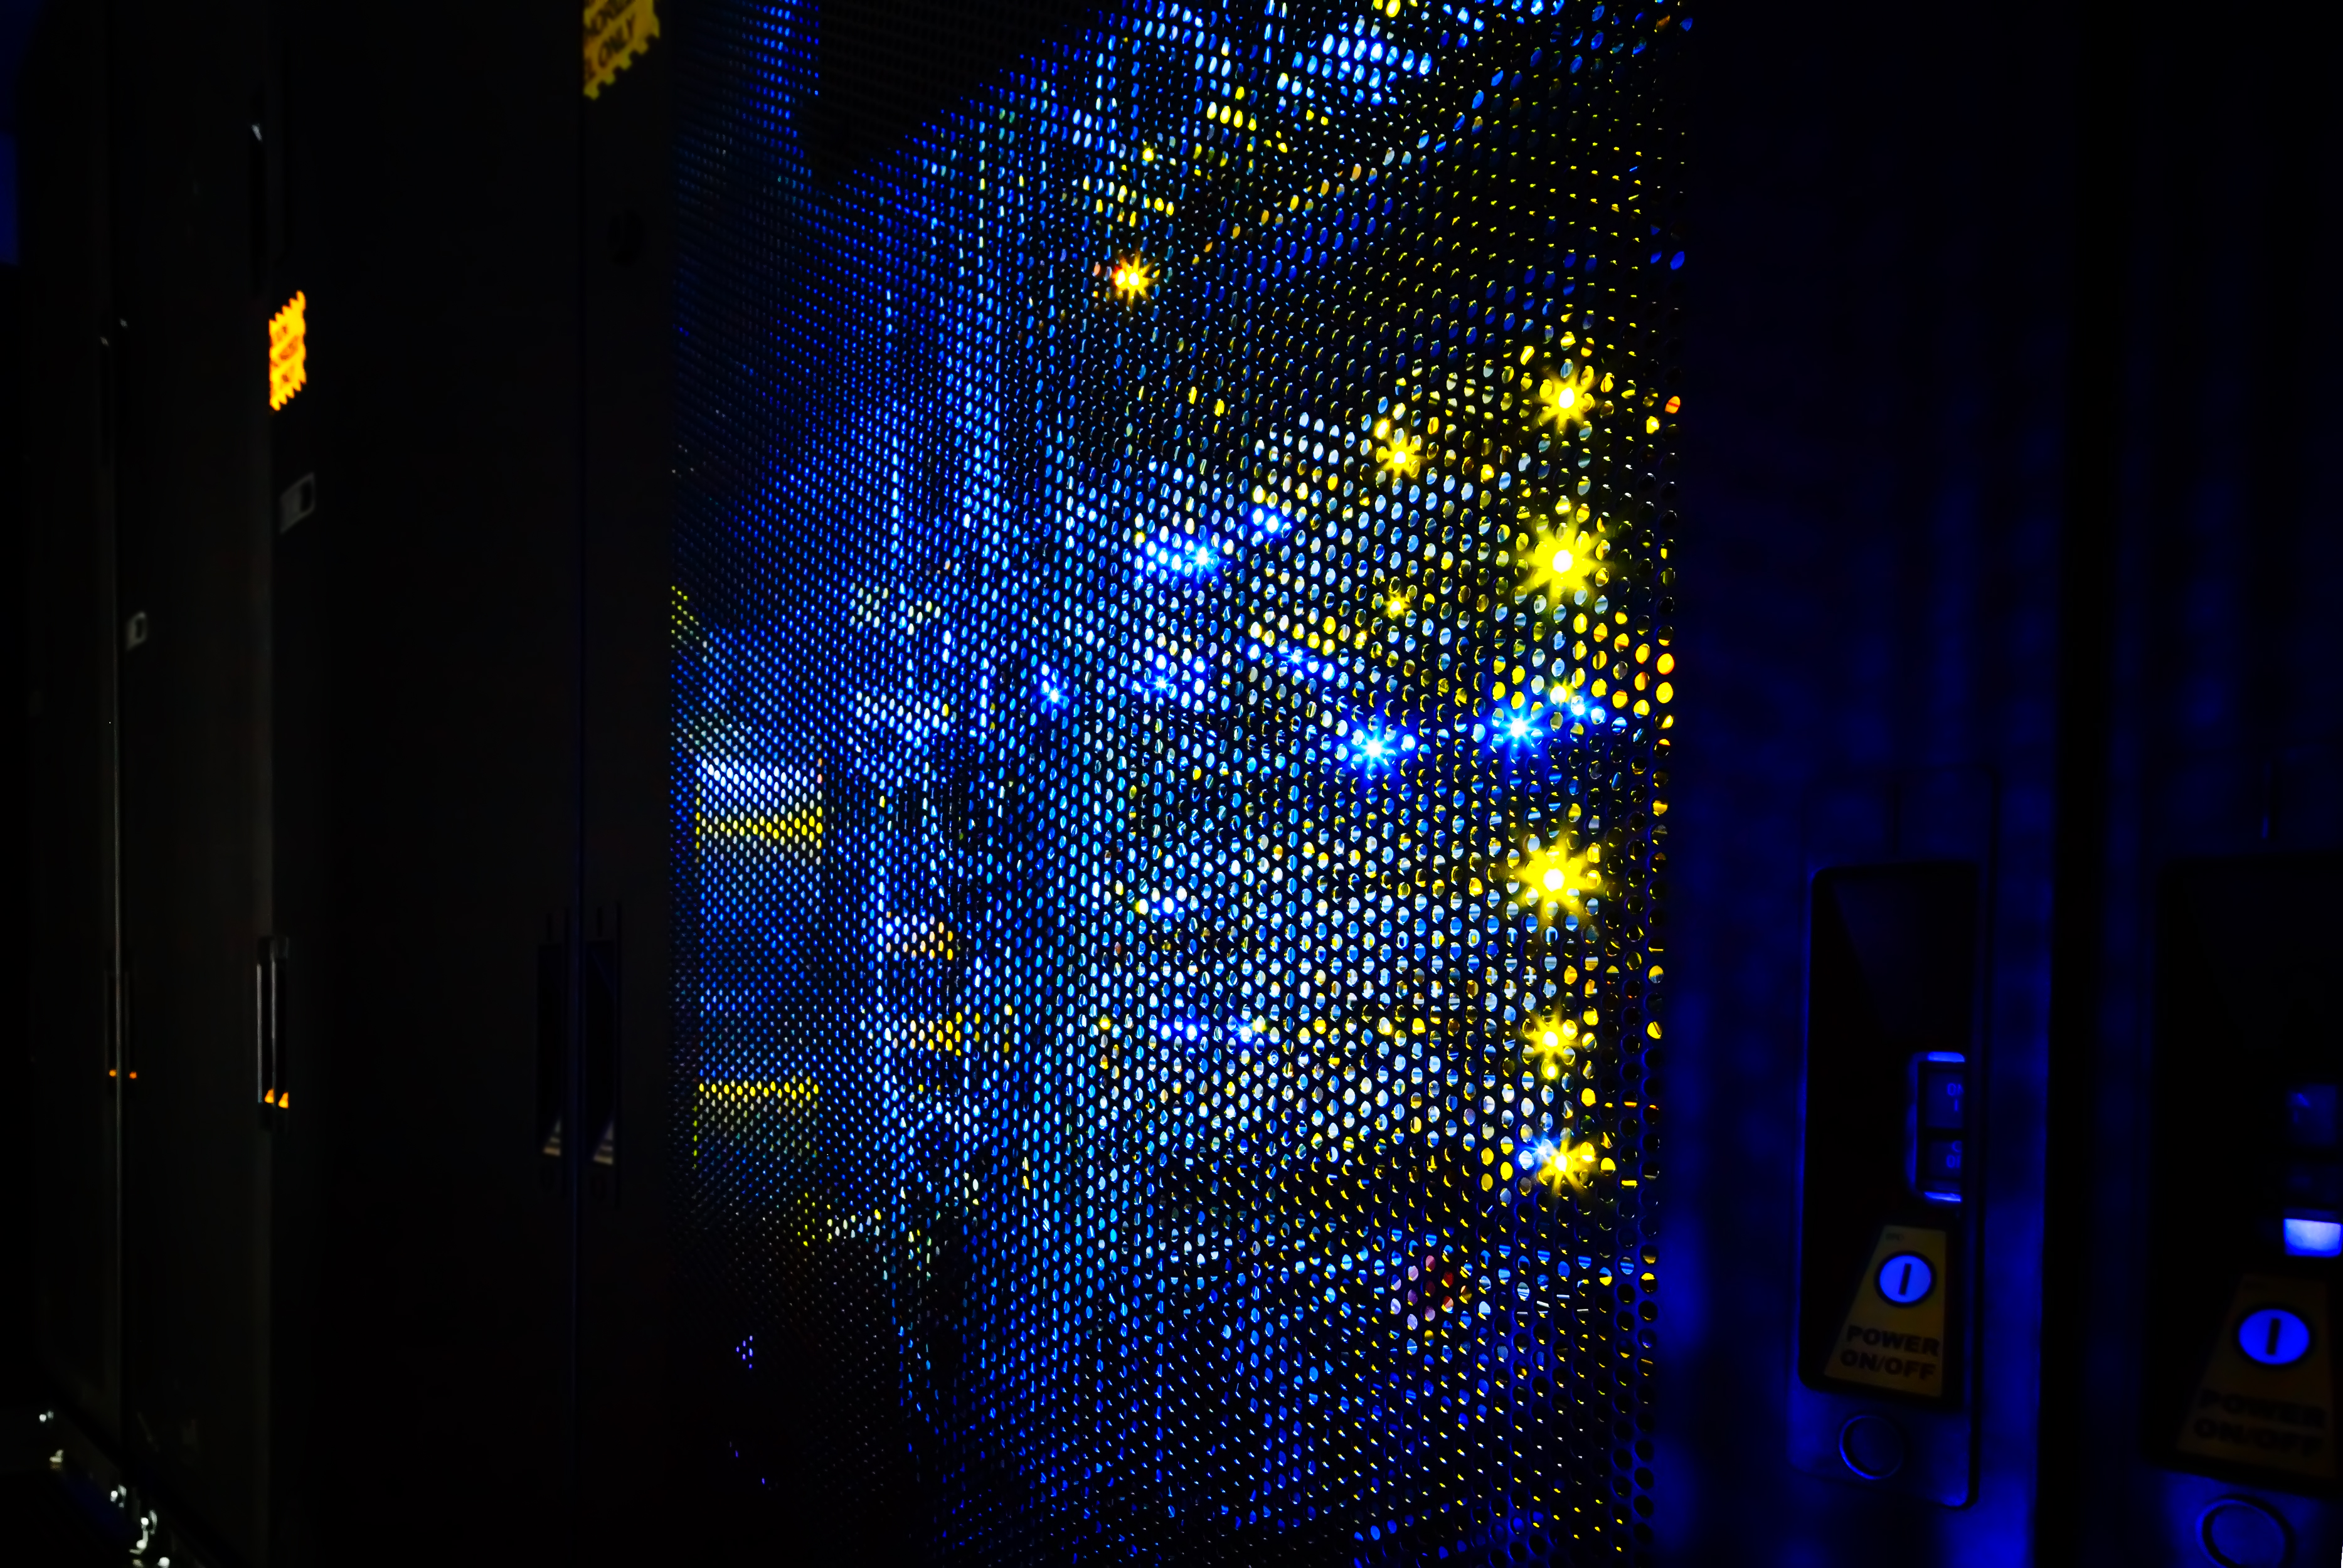 Panel, mainframe